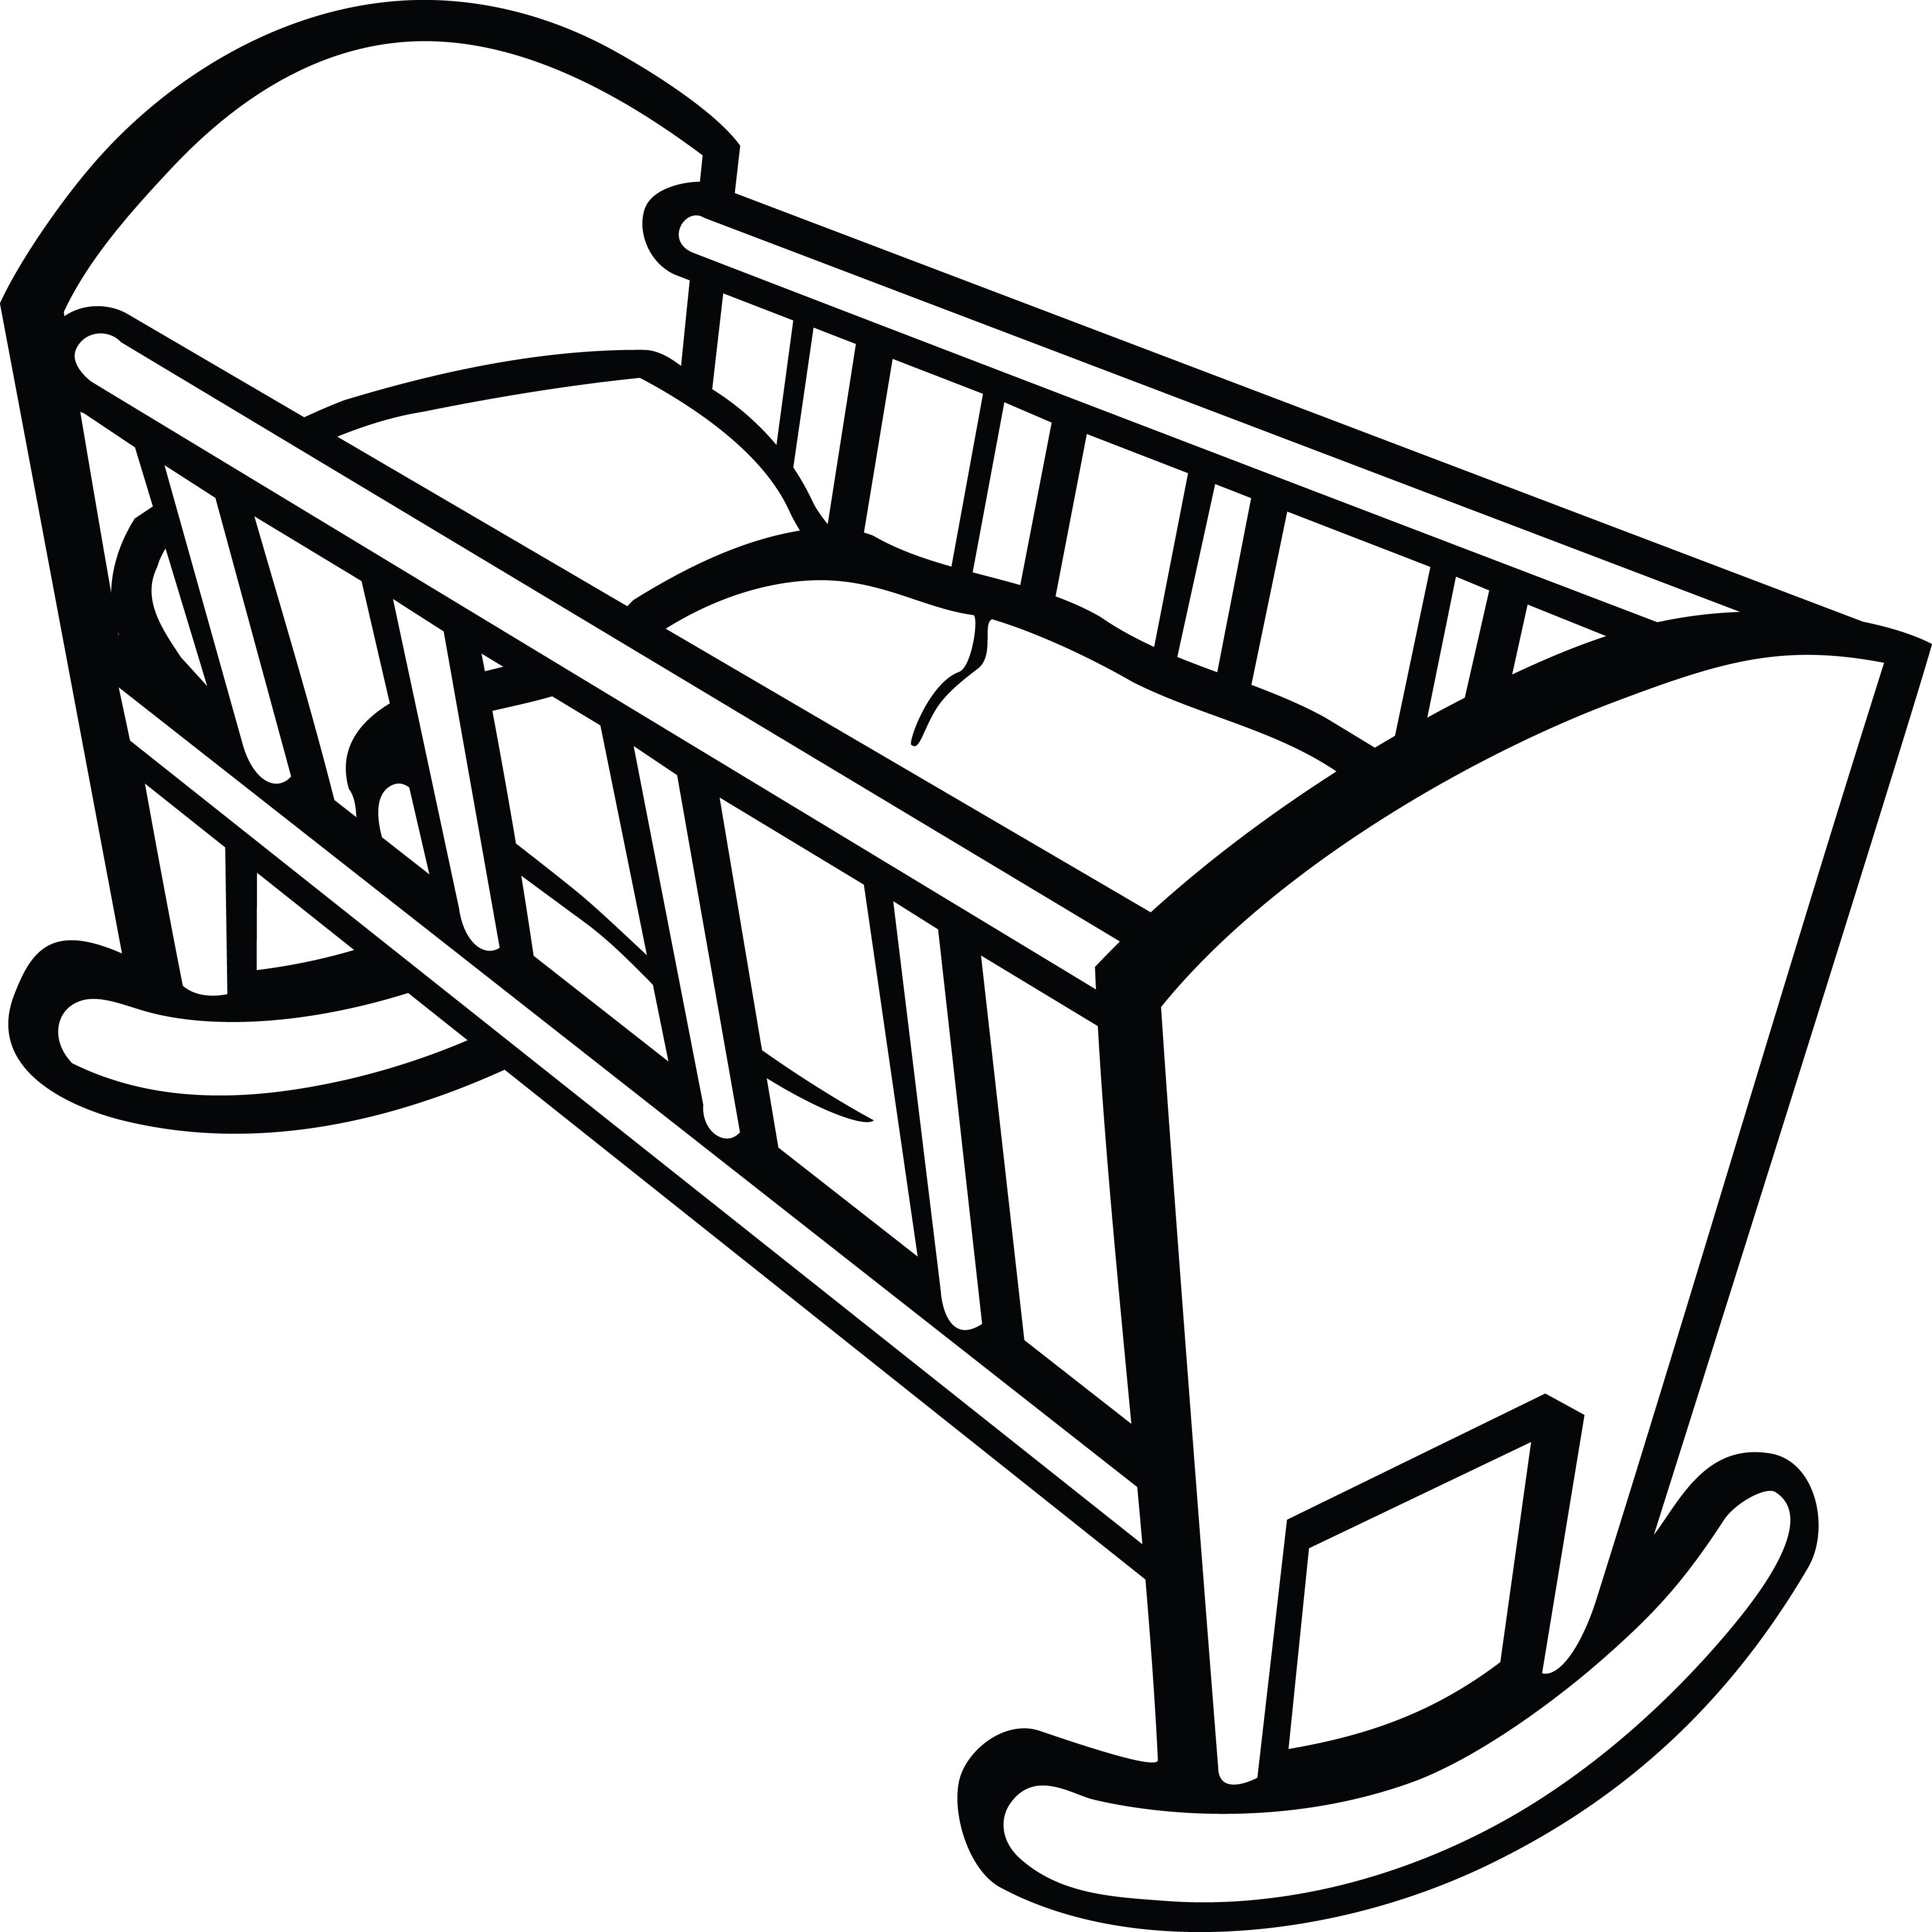 4000x4000 clipart of a baby crib crib cribs, baby cribs, clip art